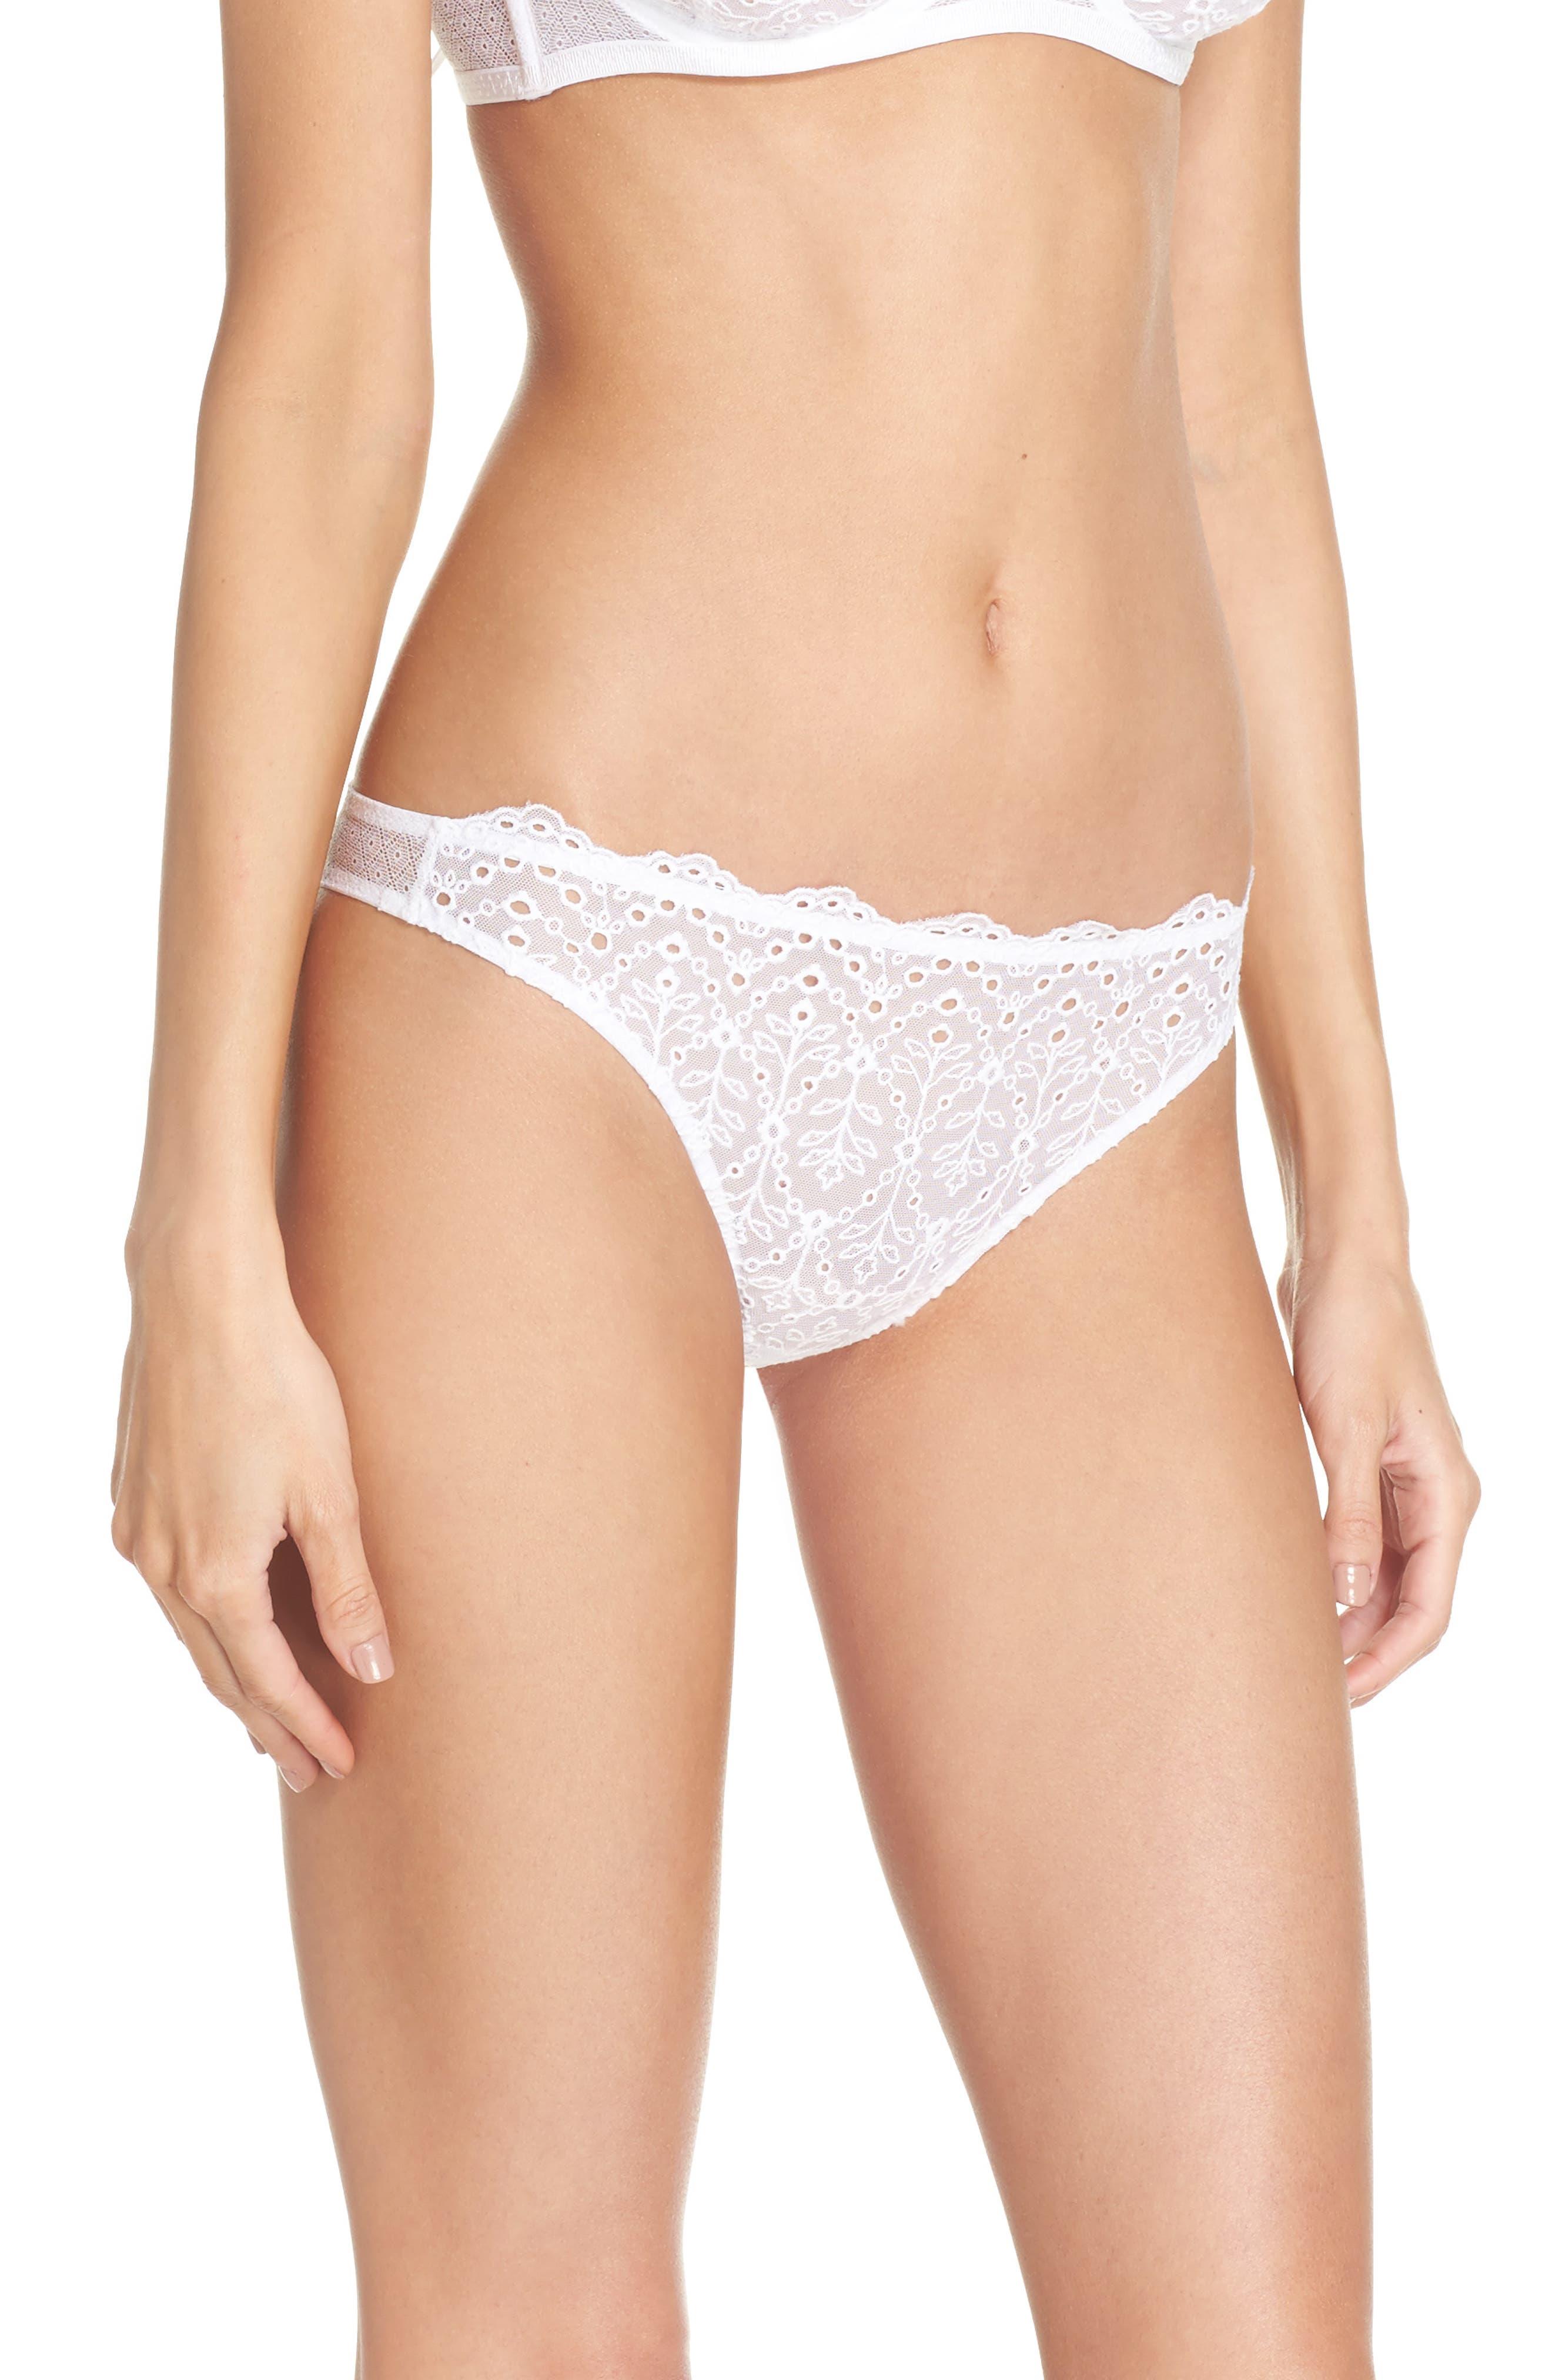 Intimately FP St. Tropez Tanga Panties,                             Alternate thumbnail 3, color,                             White